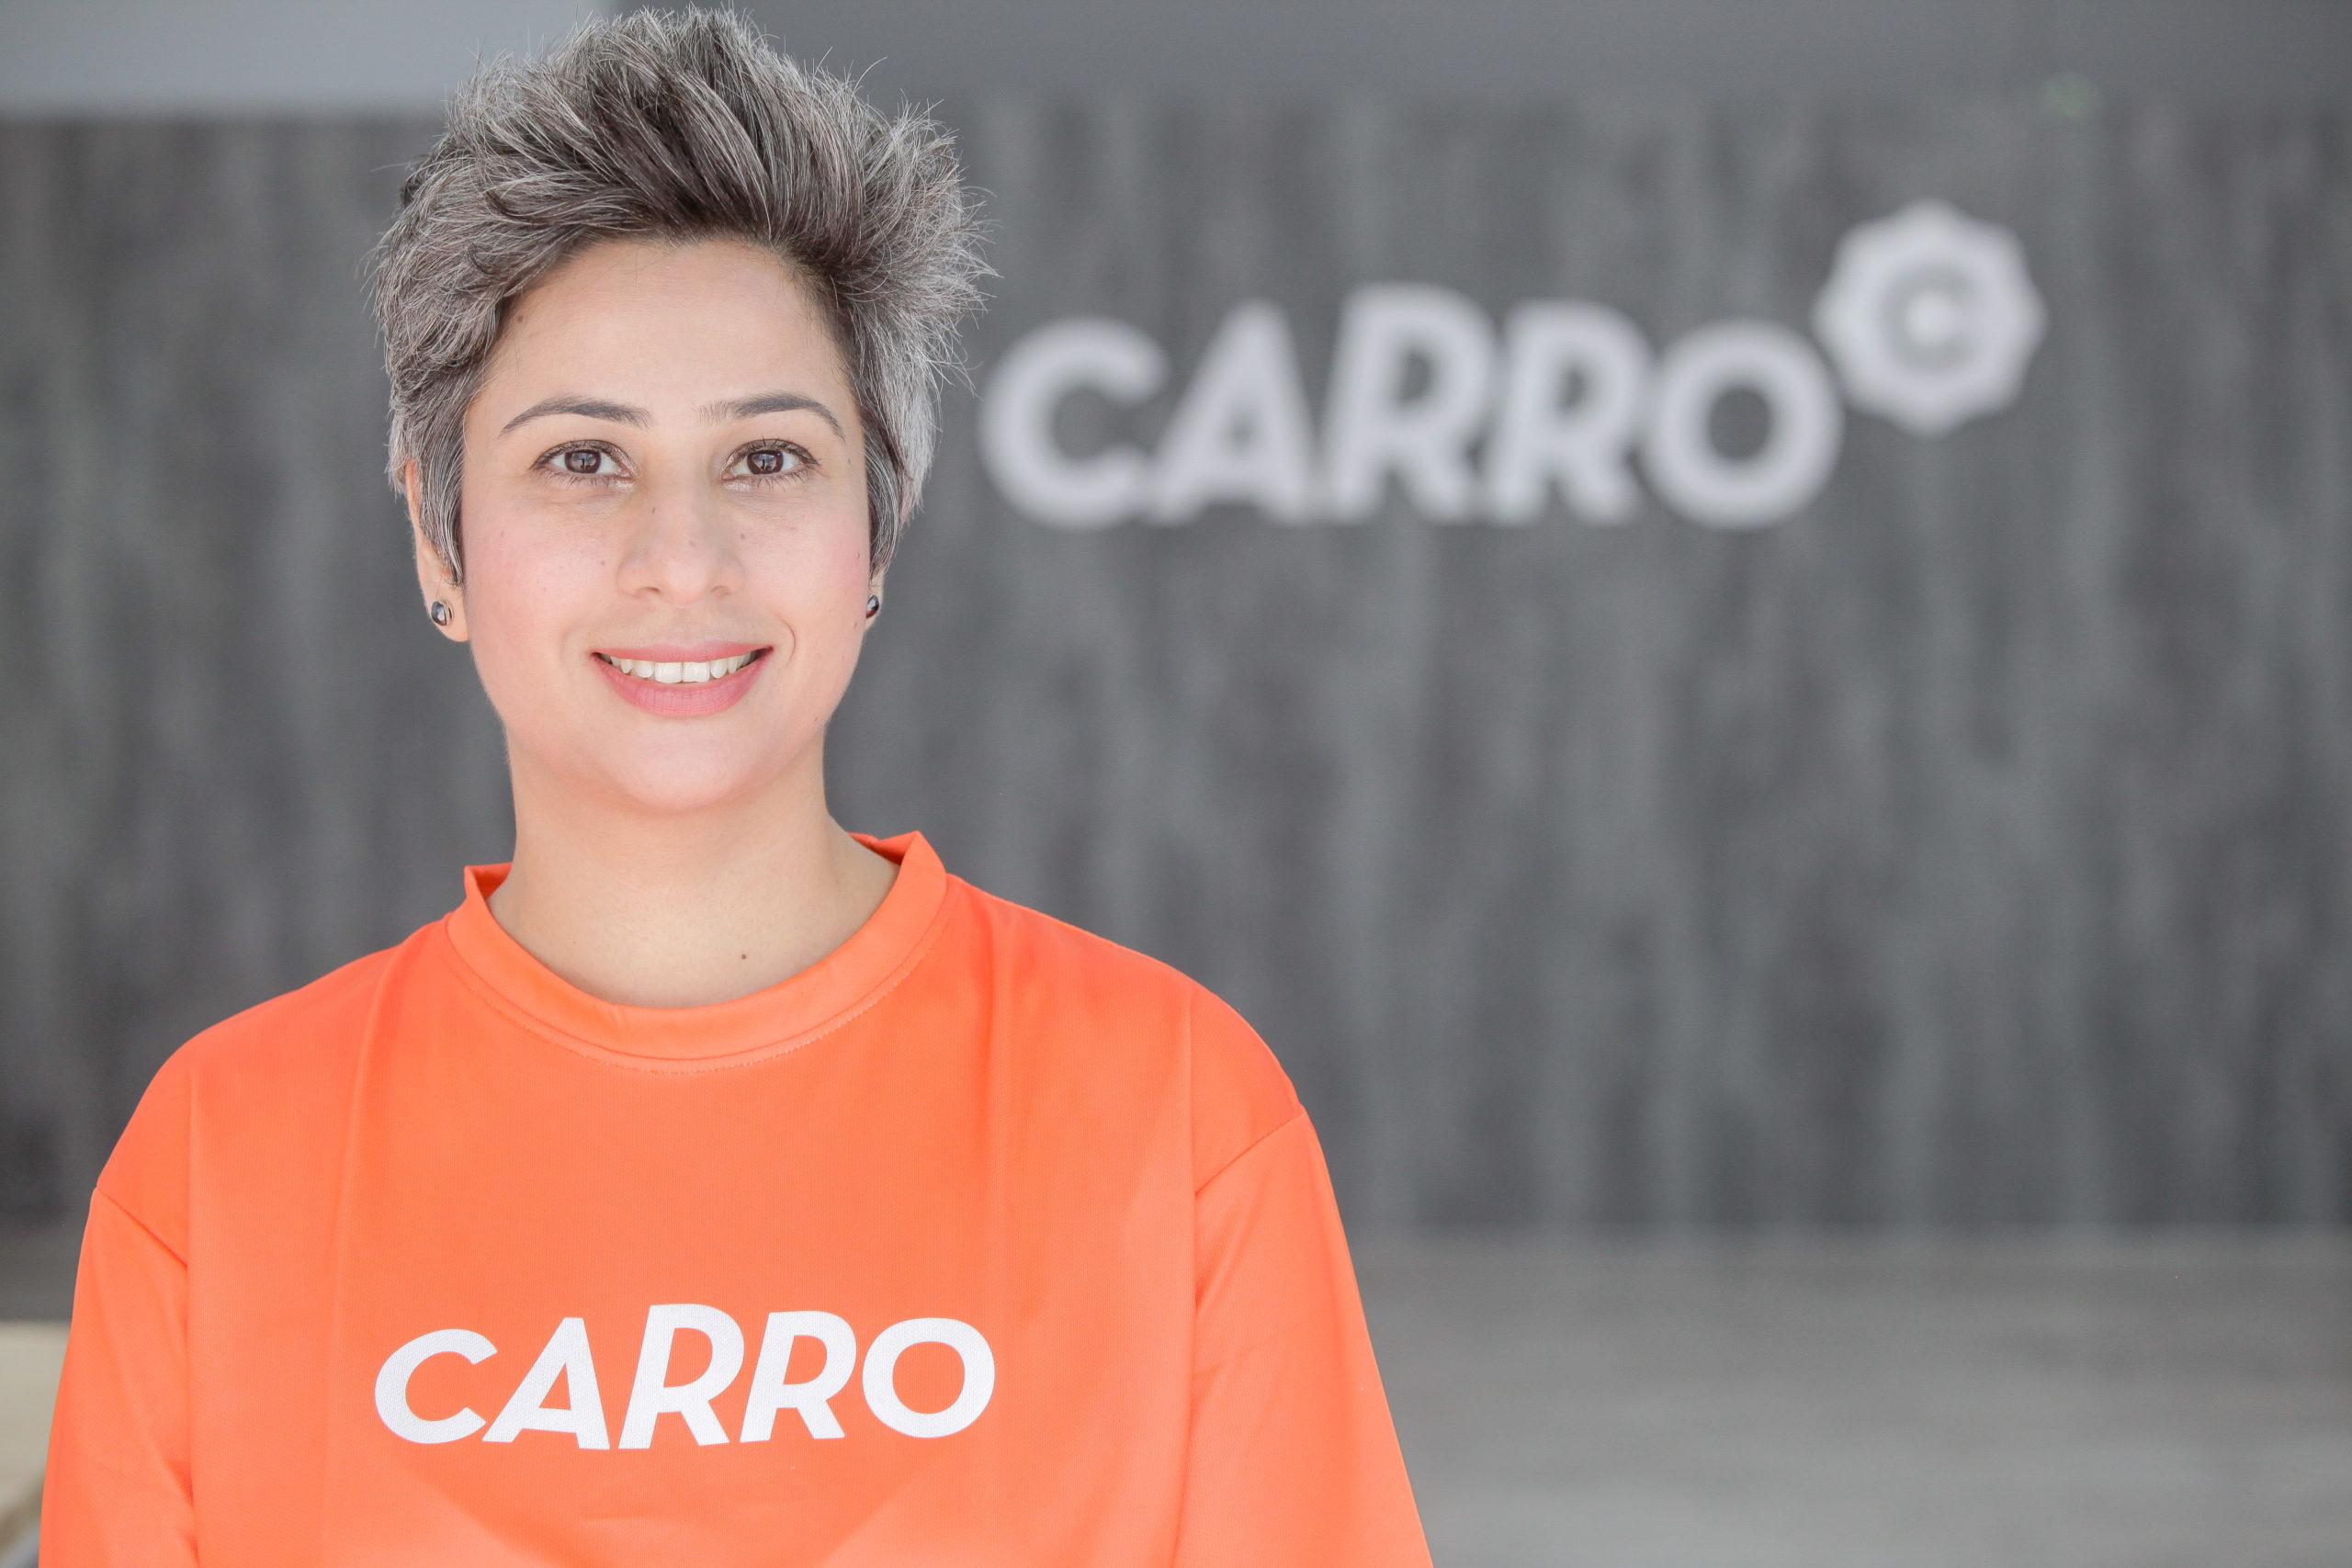 CARRO GROUP CMO MANISHA SEEWAL TAKES ON ADDITIONAL ROLE AS JUALO.COM CEO